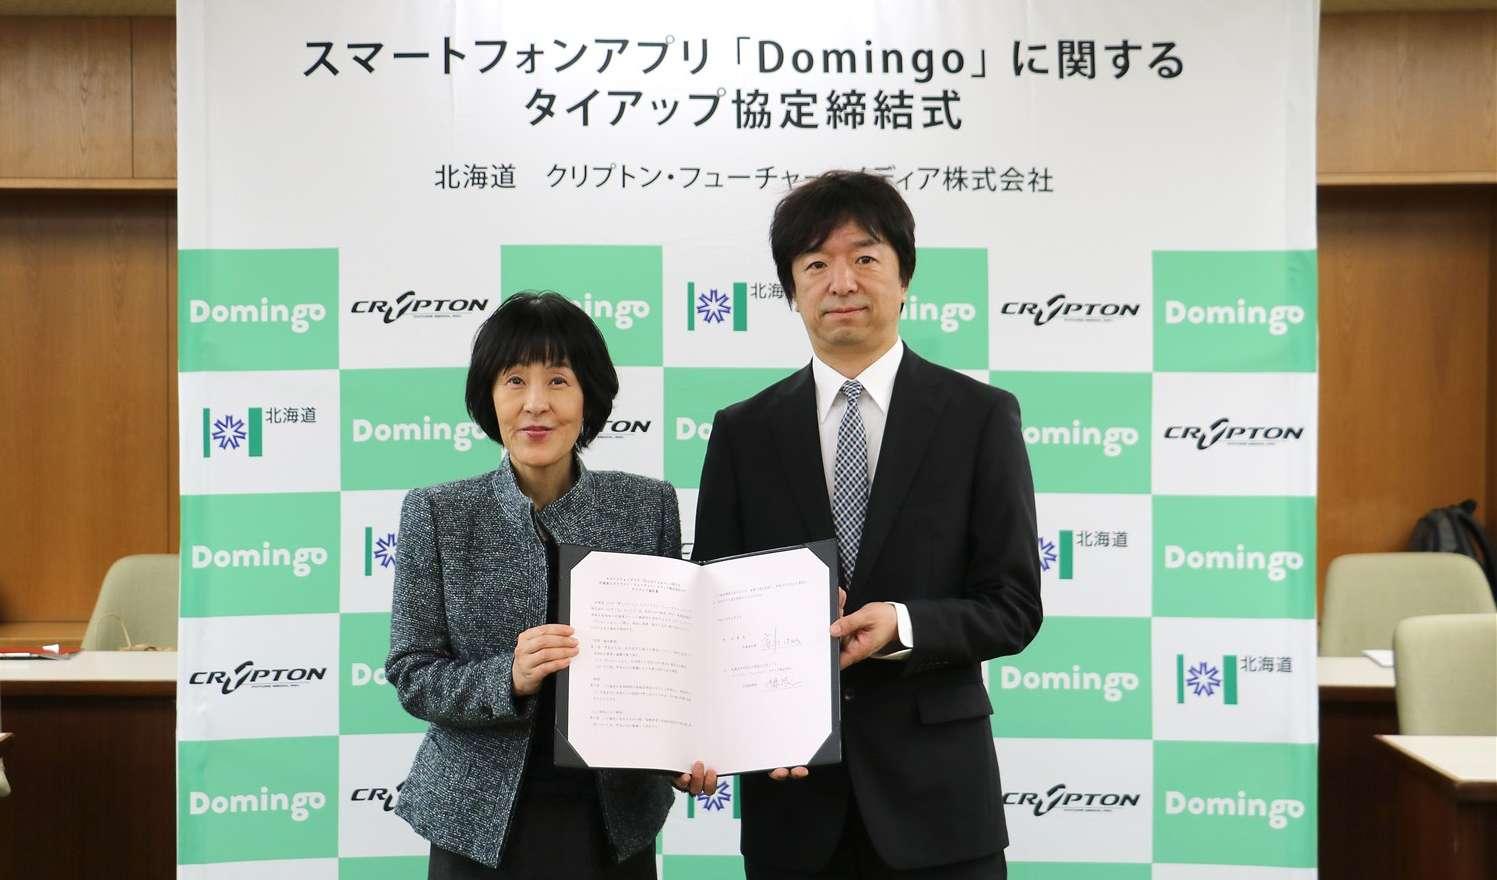 Domingoを通じて北海道に貢献。クリプトン・フューチャー・メディアが北海道とタイアップ協定を締結